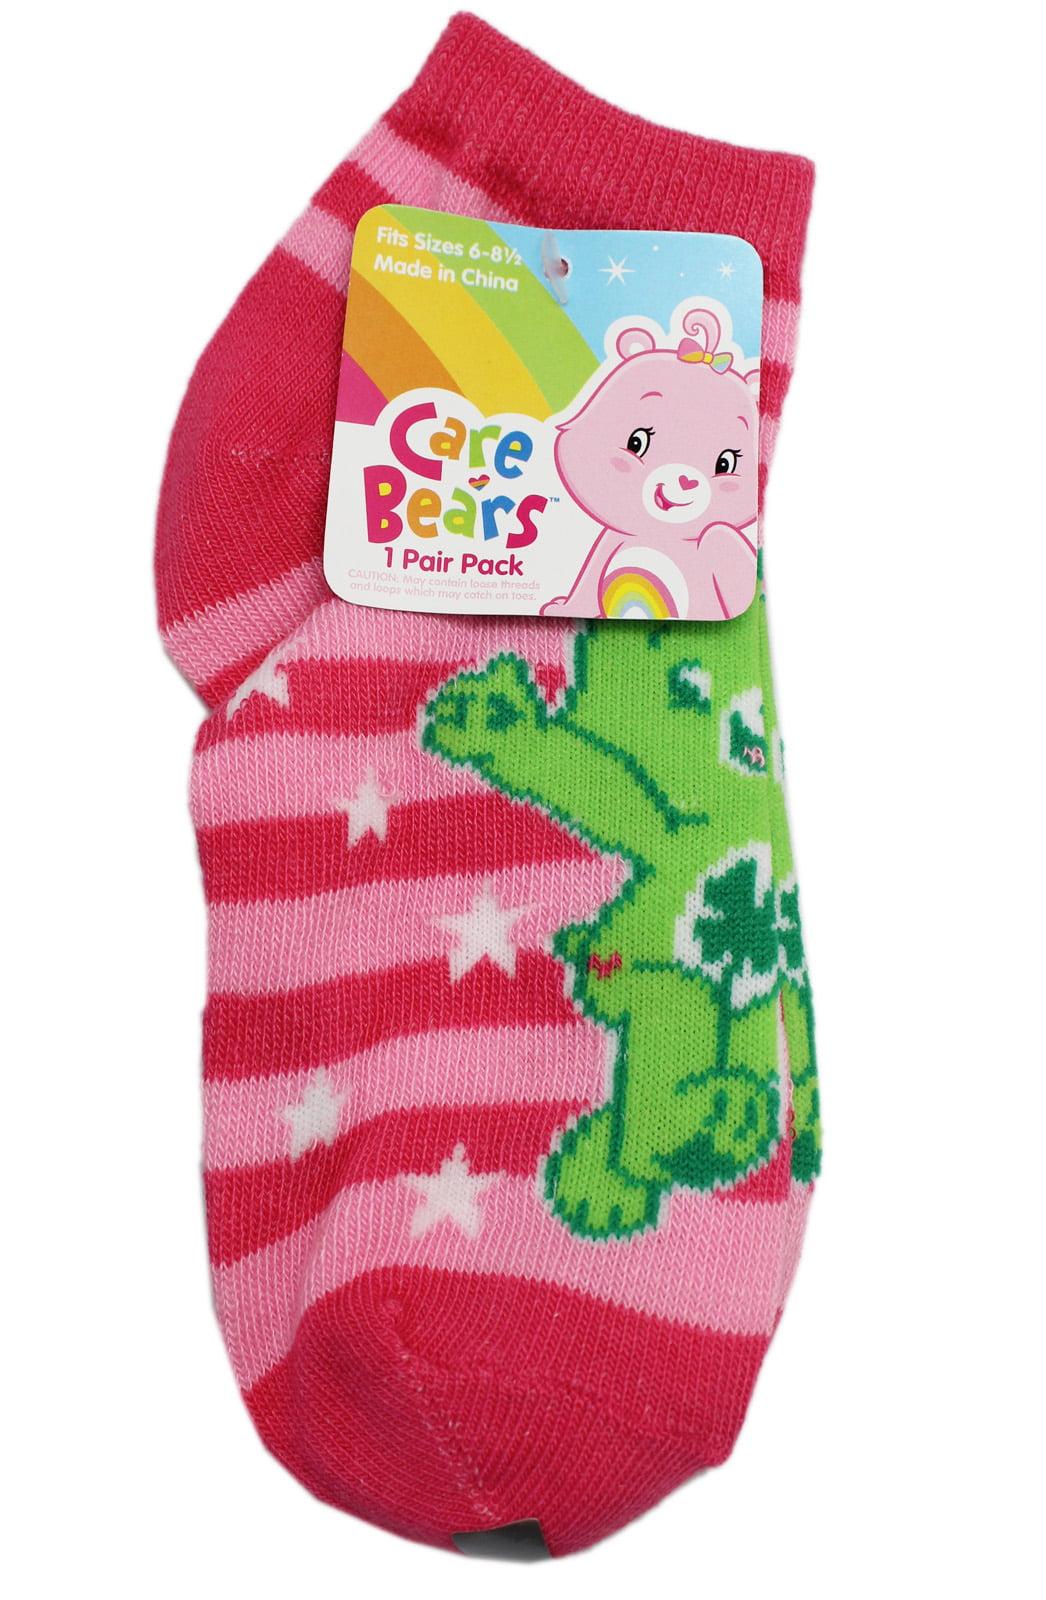 Care Bears Good Luck Bear Pink Striped Kids Socks Size 6-8, 2 Pairs